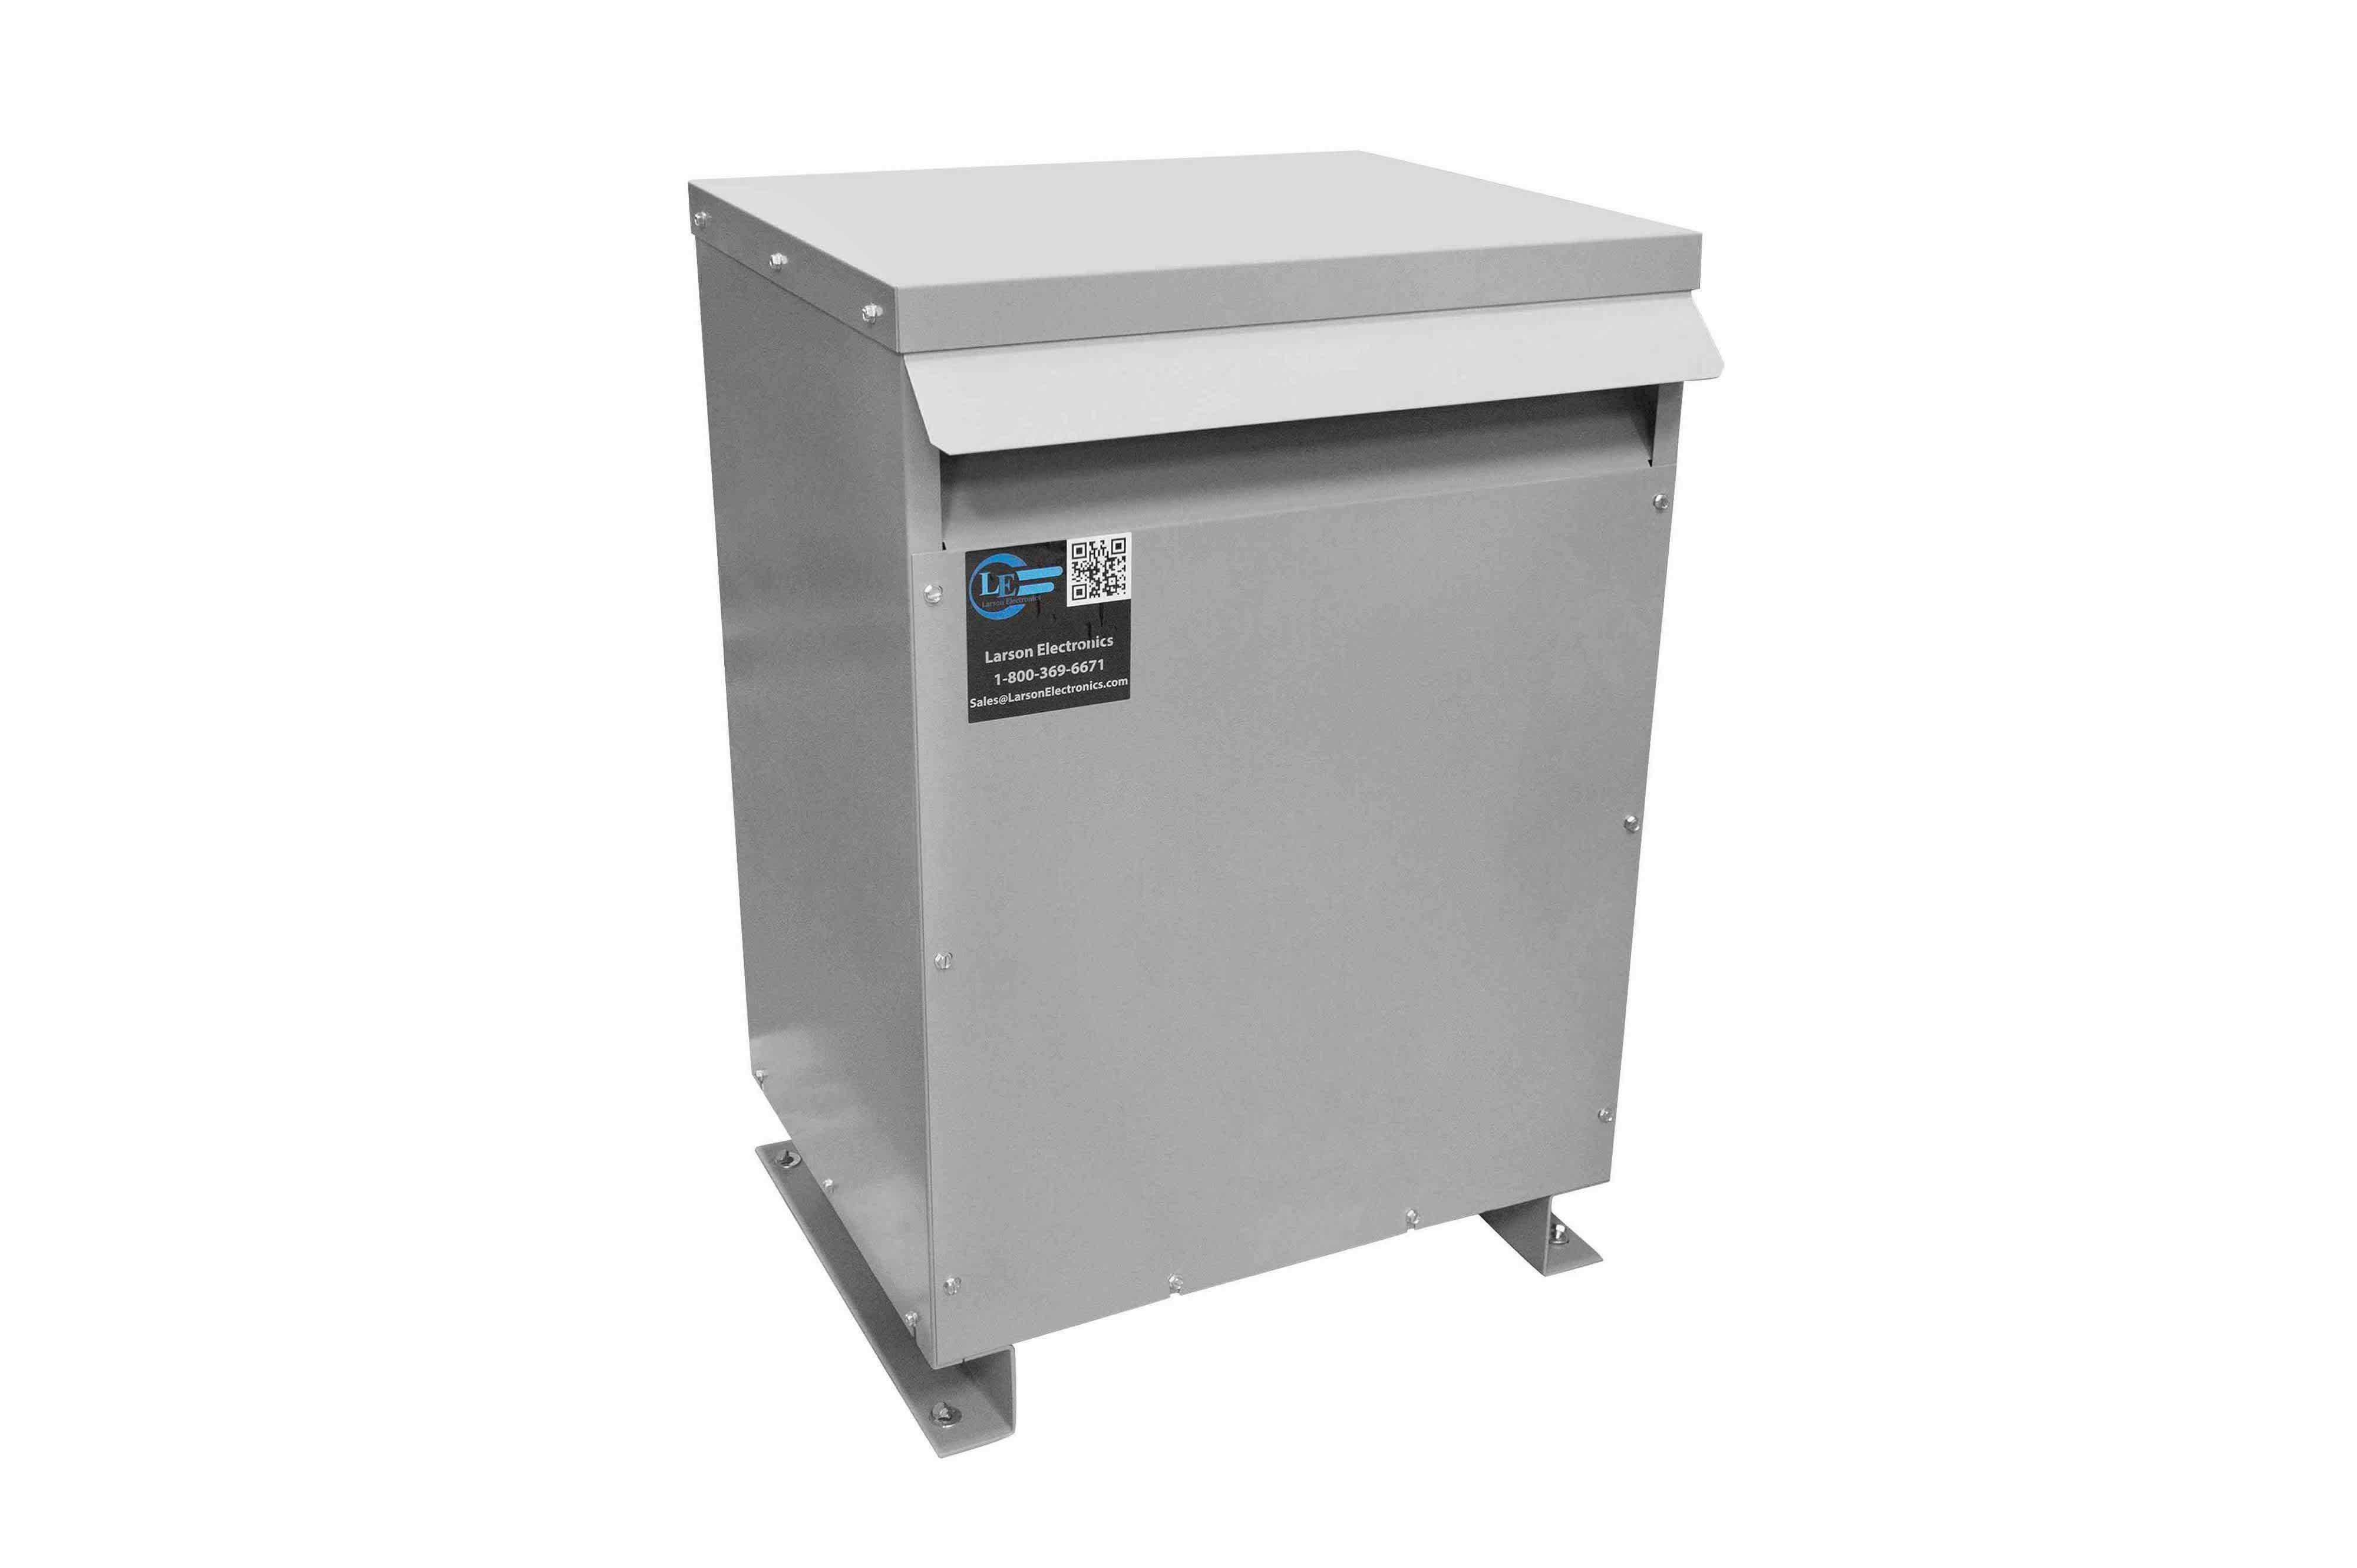 150 kVA 3PH DOE Transformer, 480V Delta Primary, 480Y/277 Wye-N Secondary, N3R, Ventilated, 60 Hz